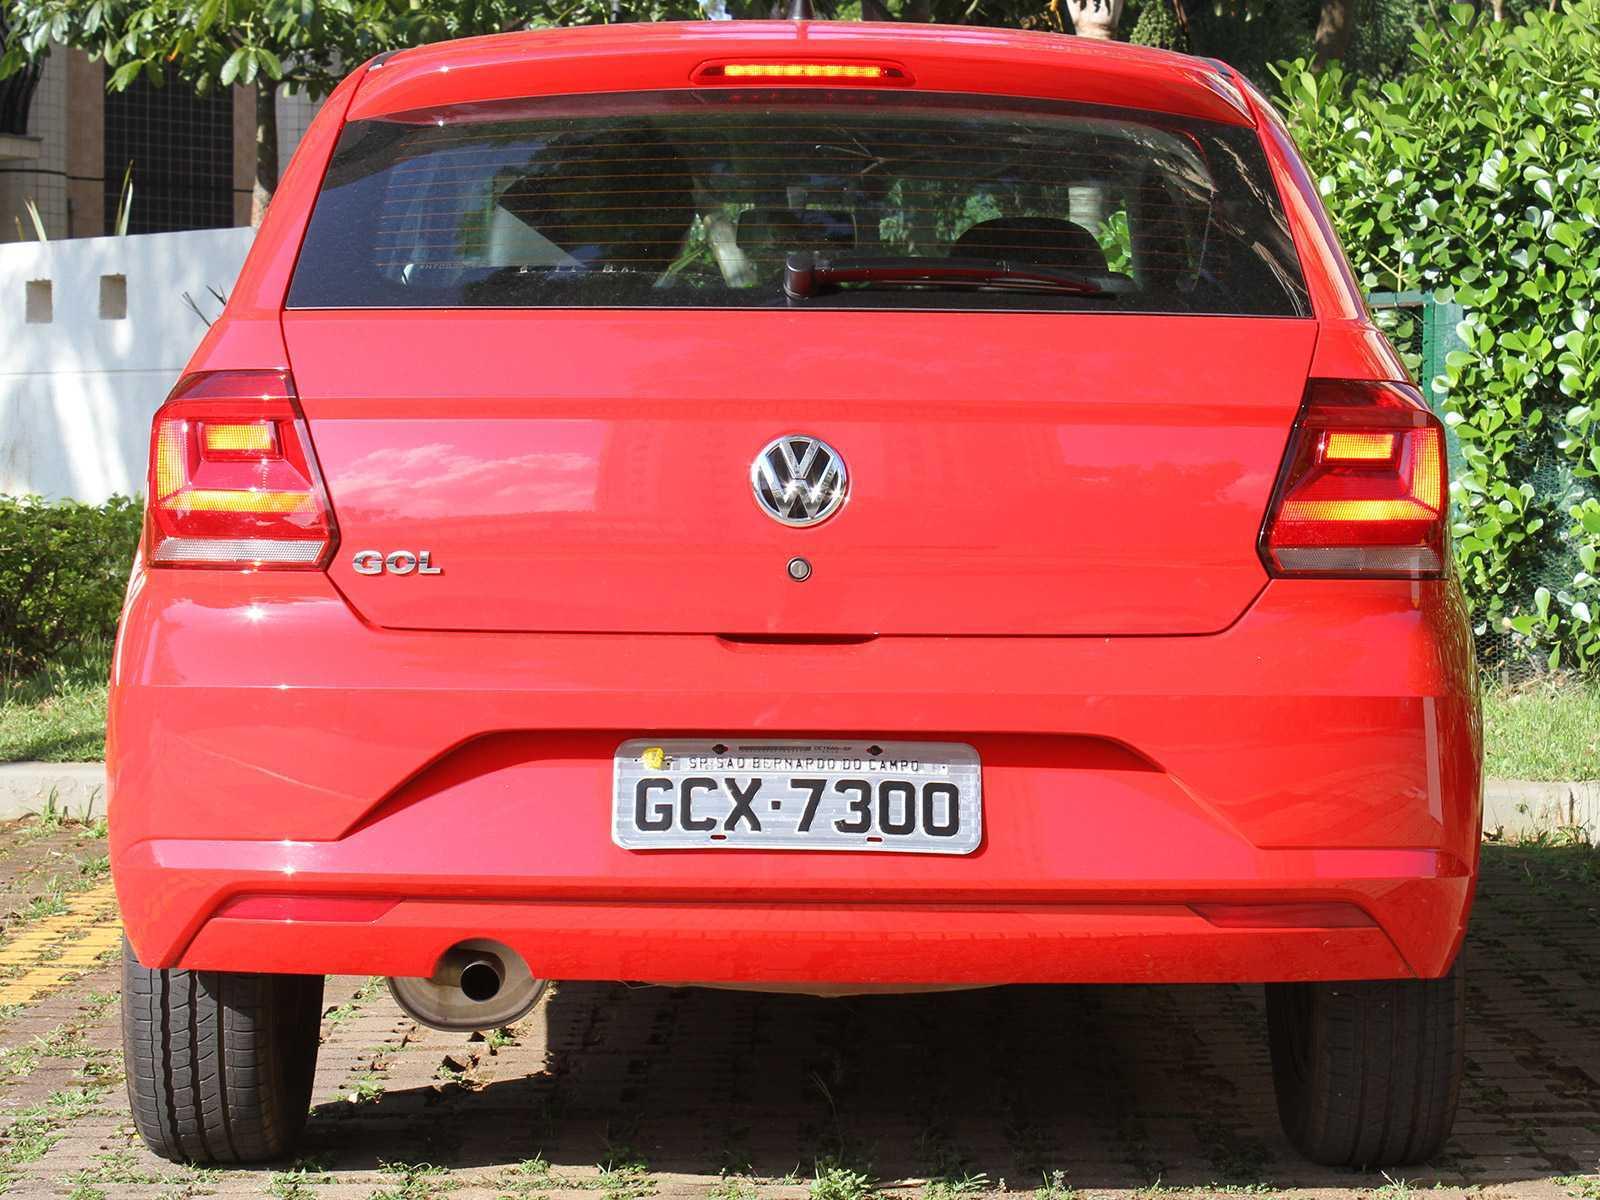 VolkswagenGol 2017 - traseira